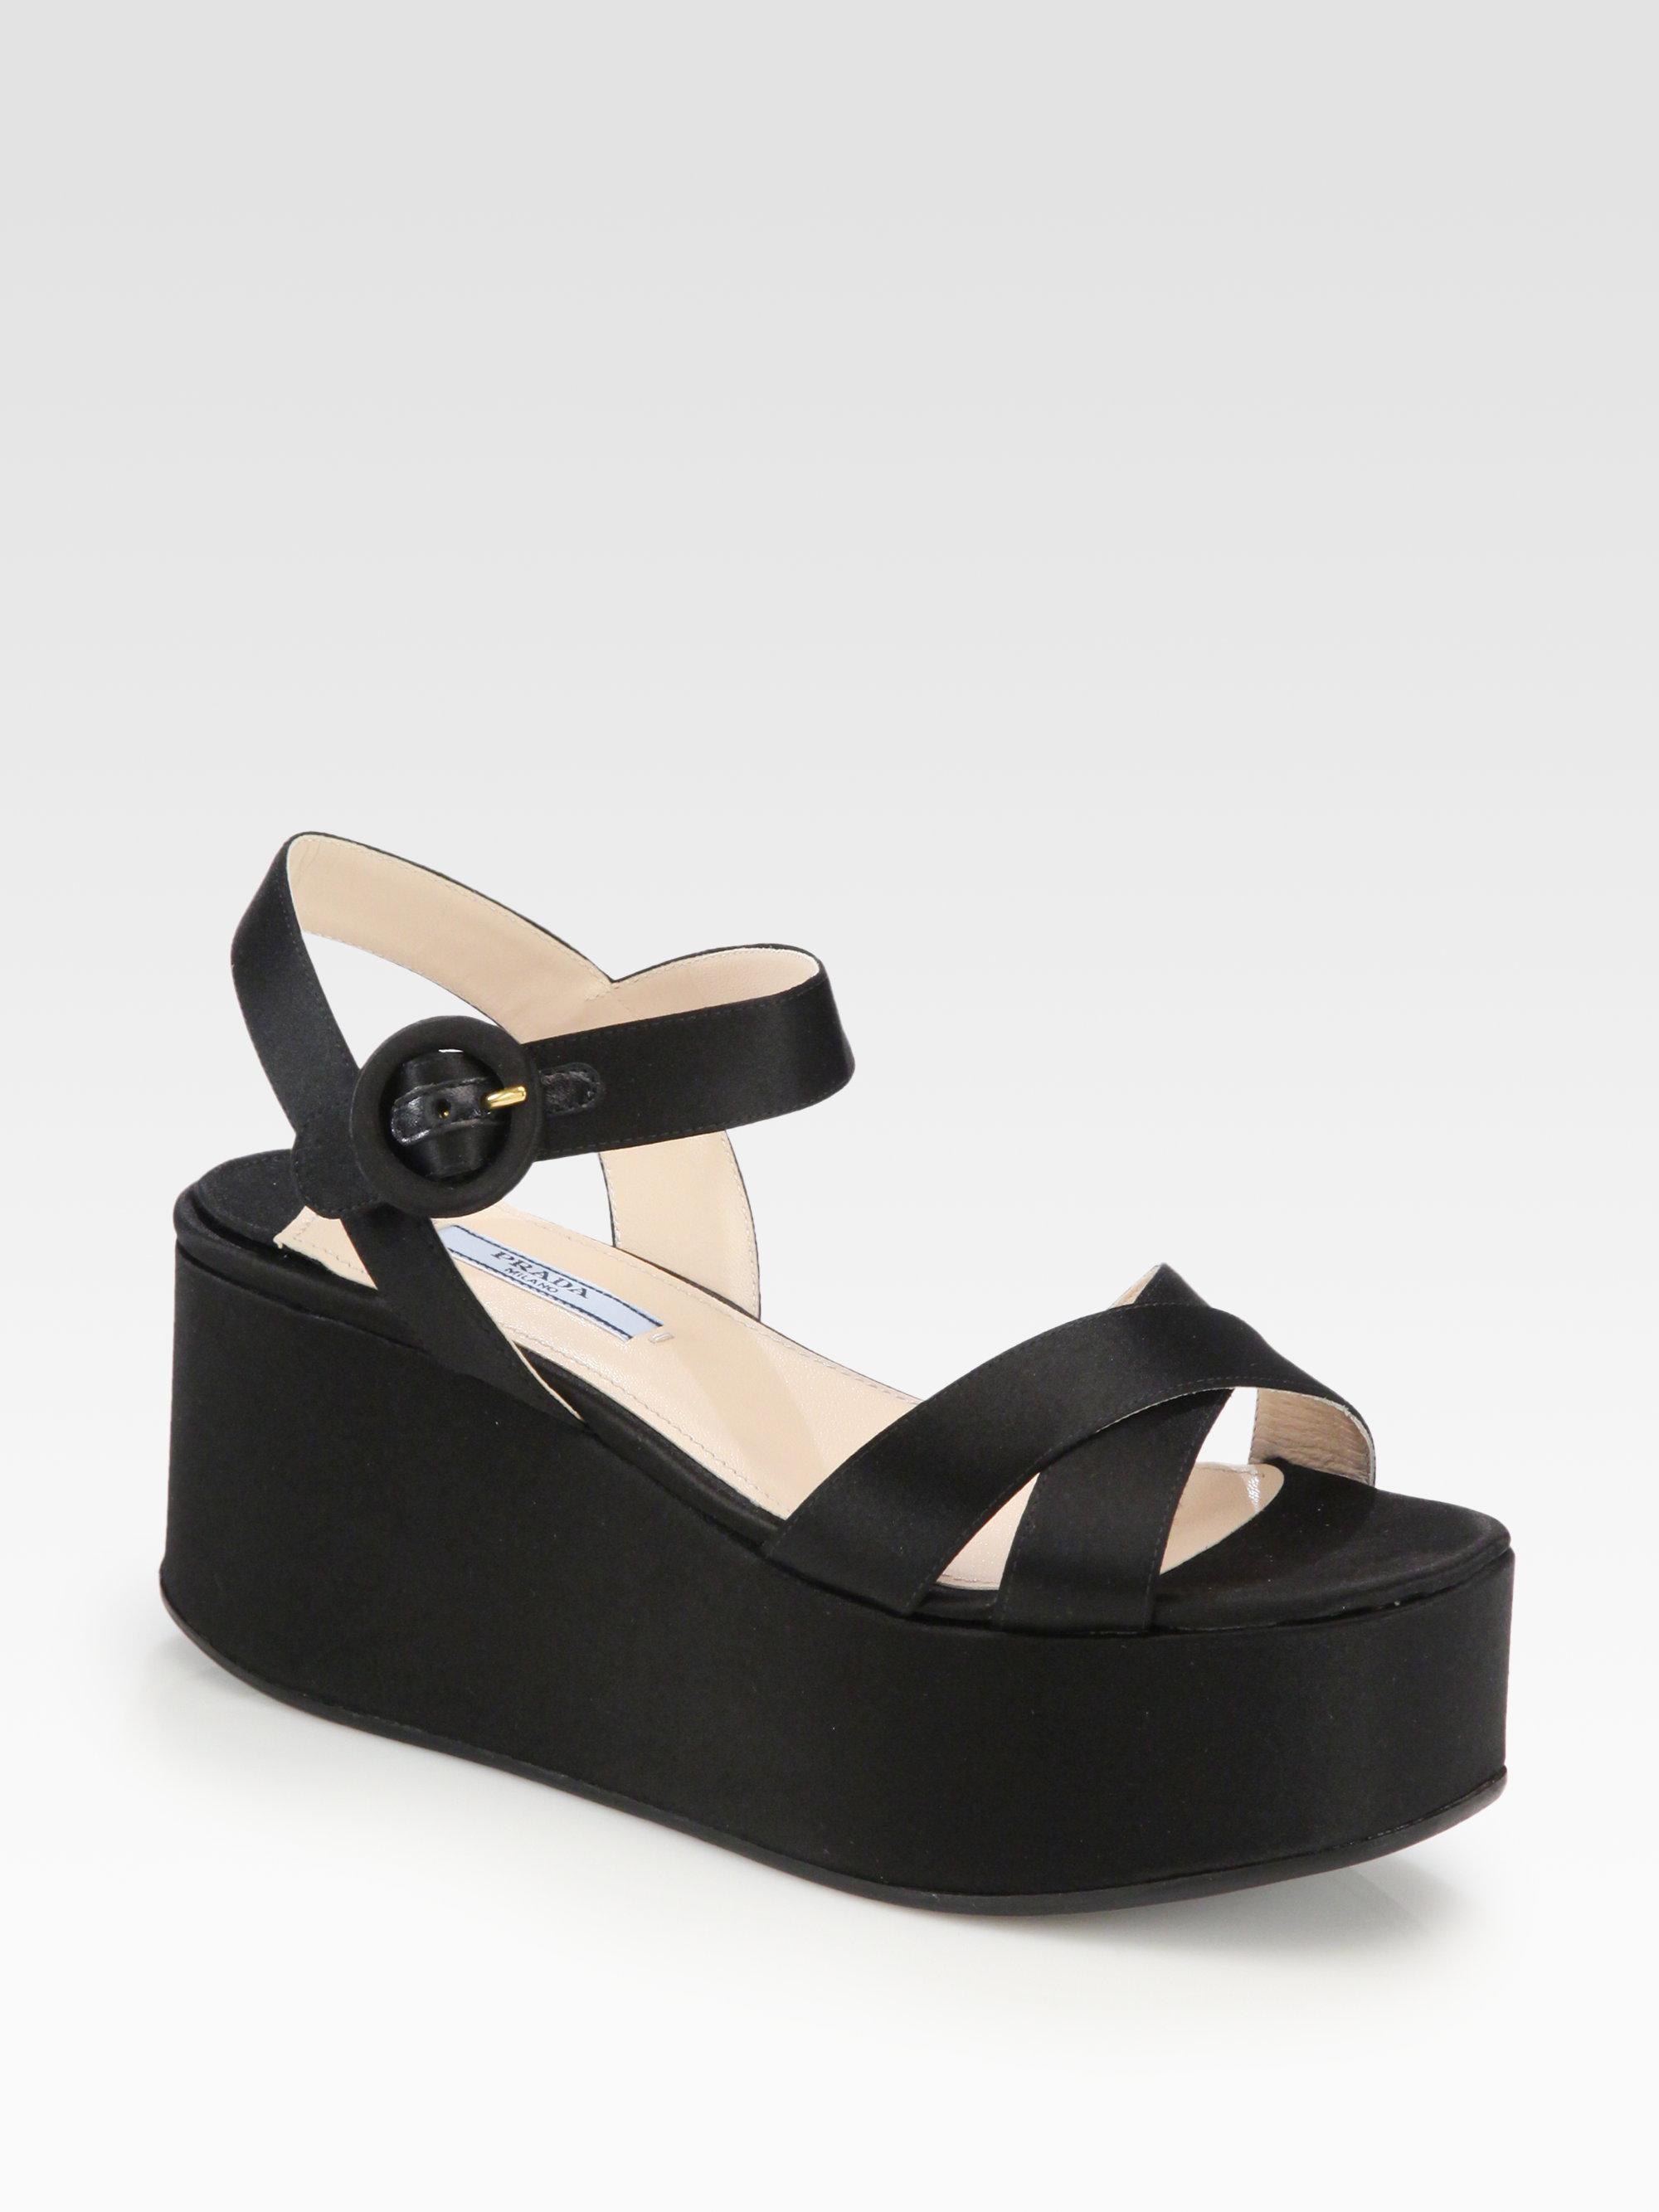 5855f6dff81f Lyst - Prada Satin Platform Wedge Sandals in Black